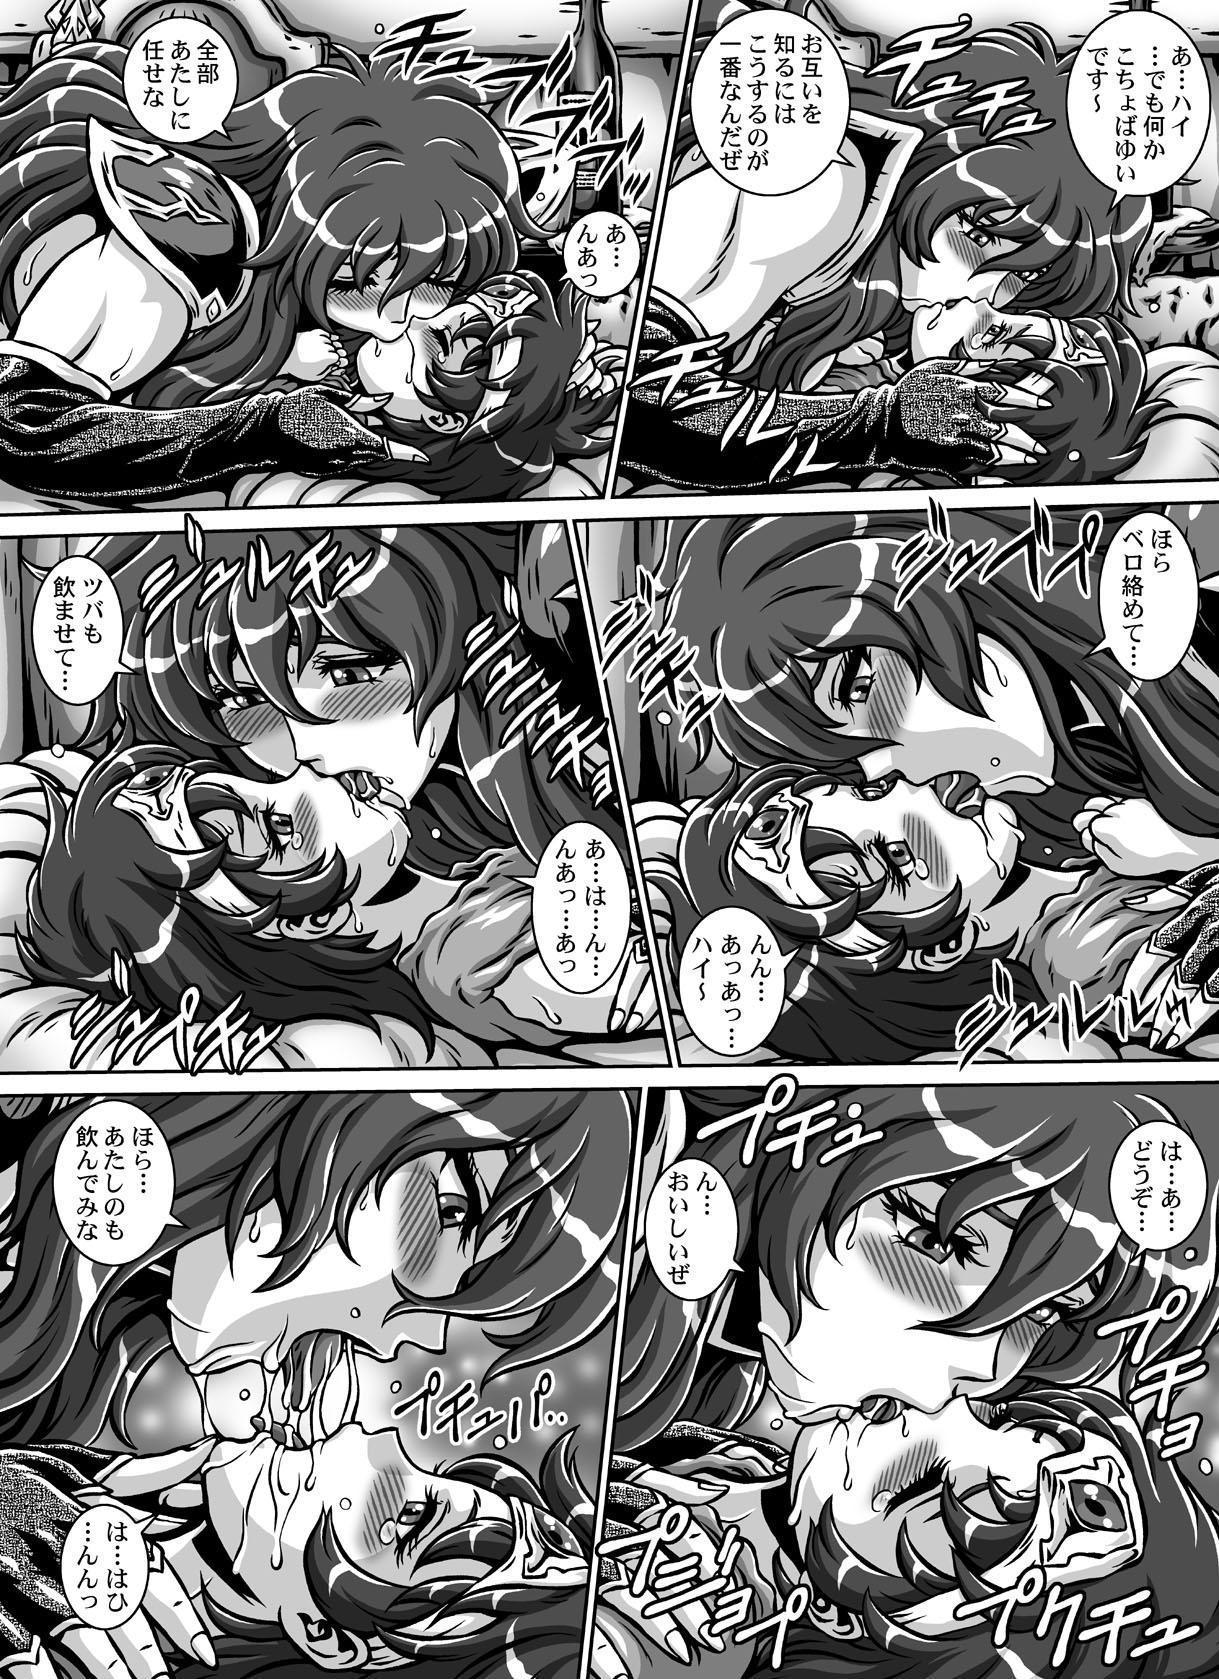 [Naginata-kan (Matsurino Naginata)] D-Q-R ~PROOF OF THE HERO~ (Dragon Quest III) [Digital] 32